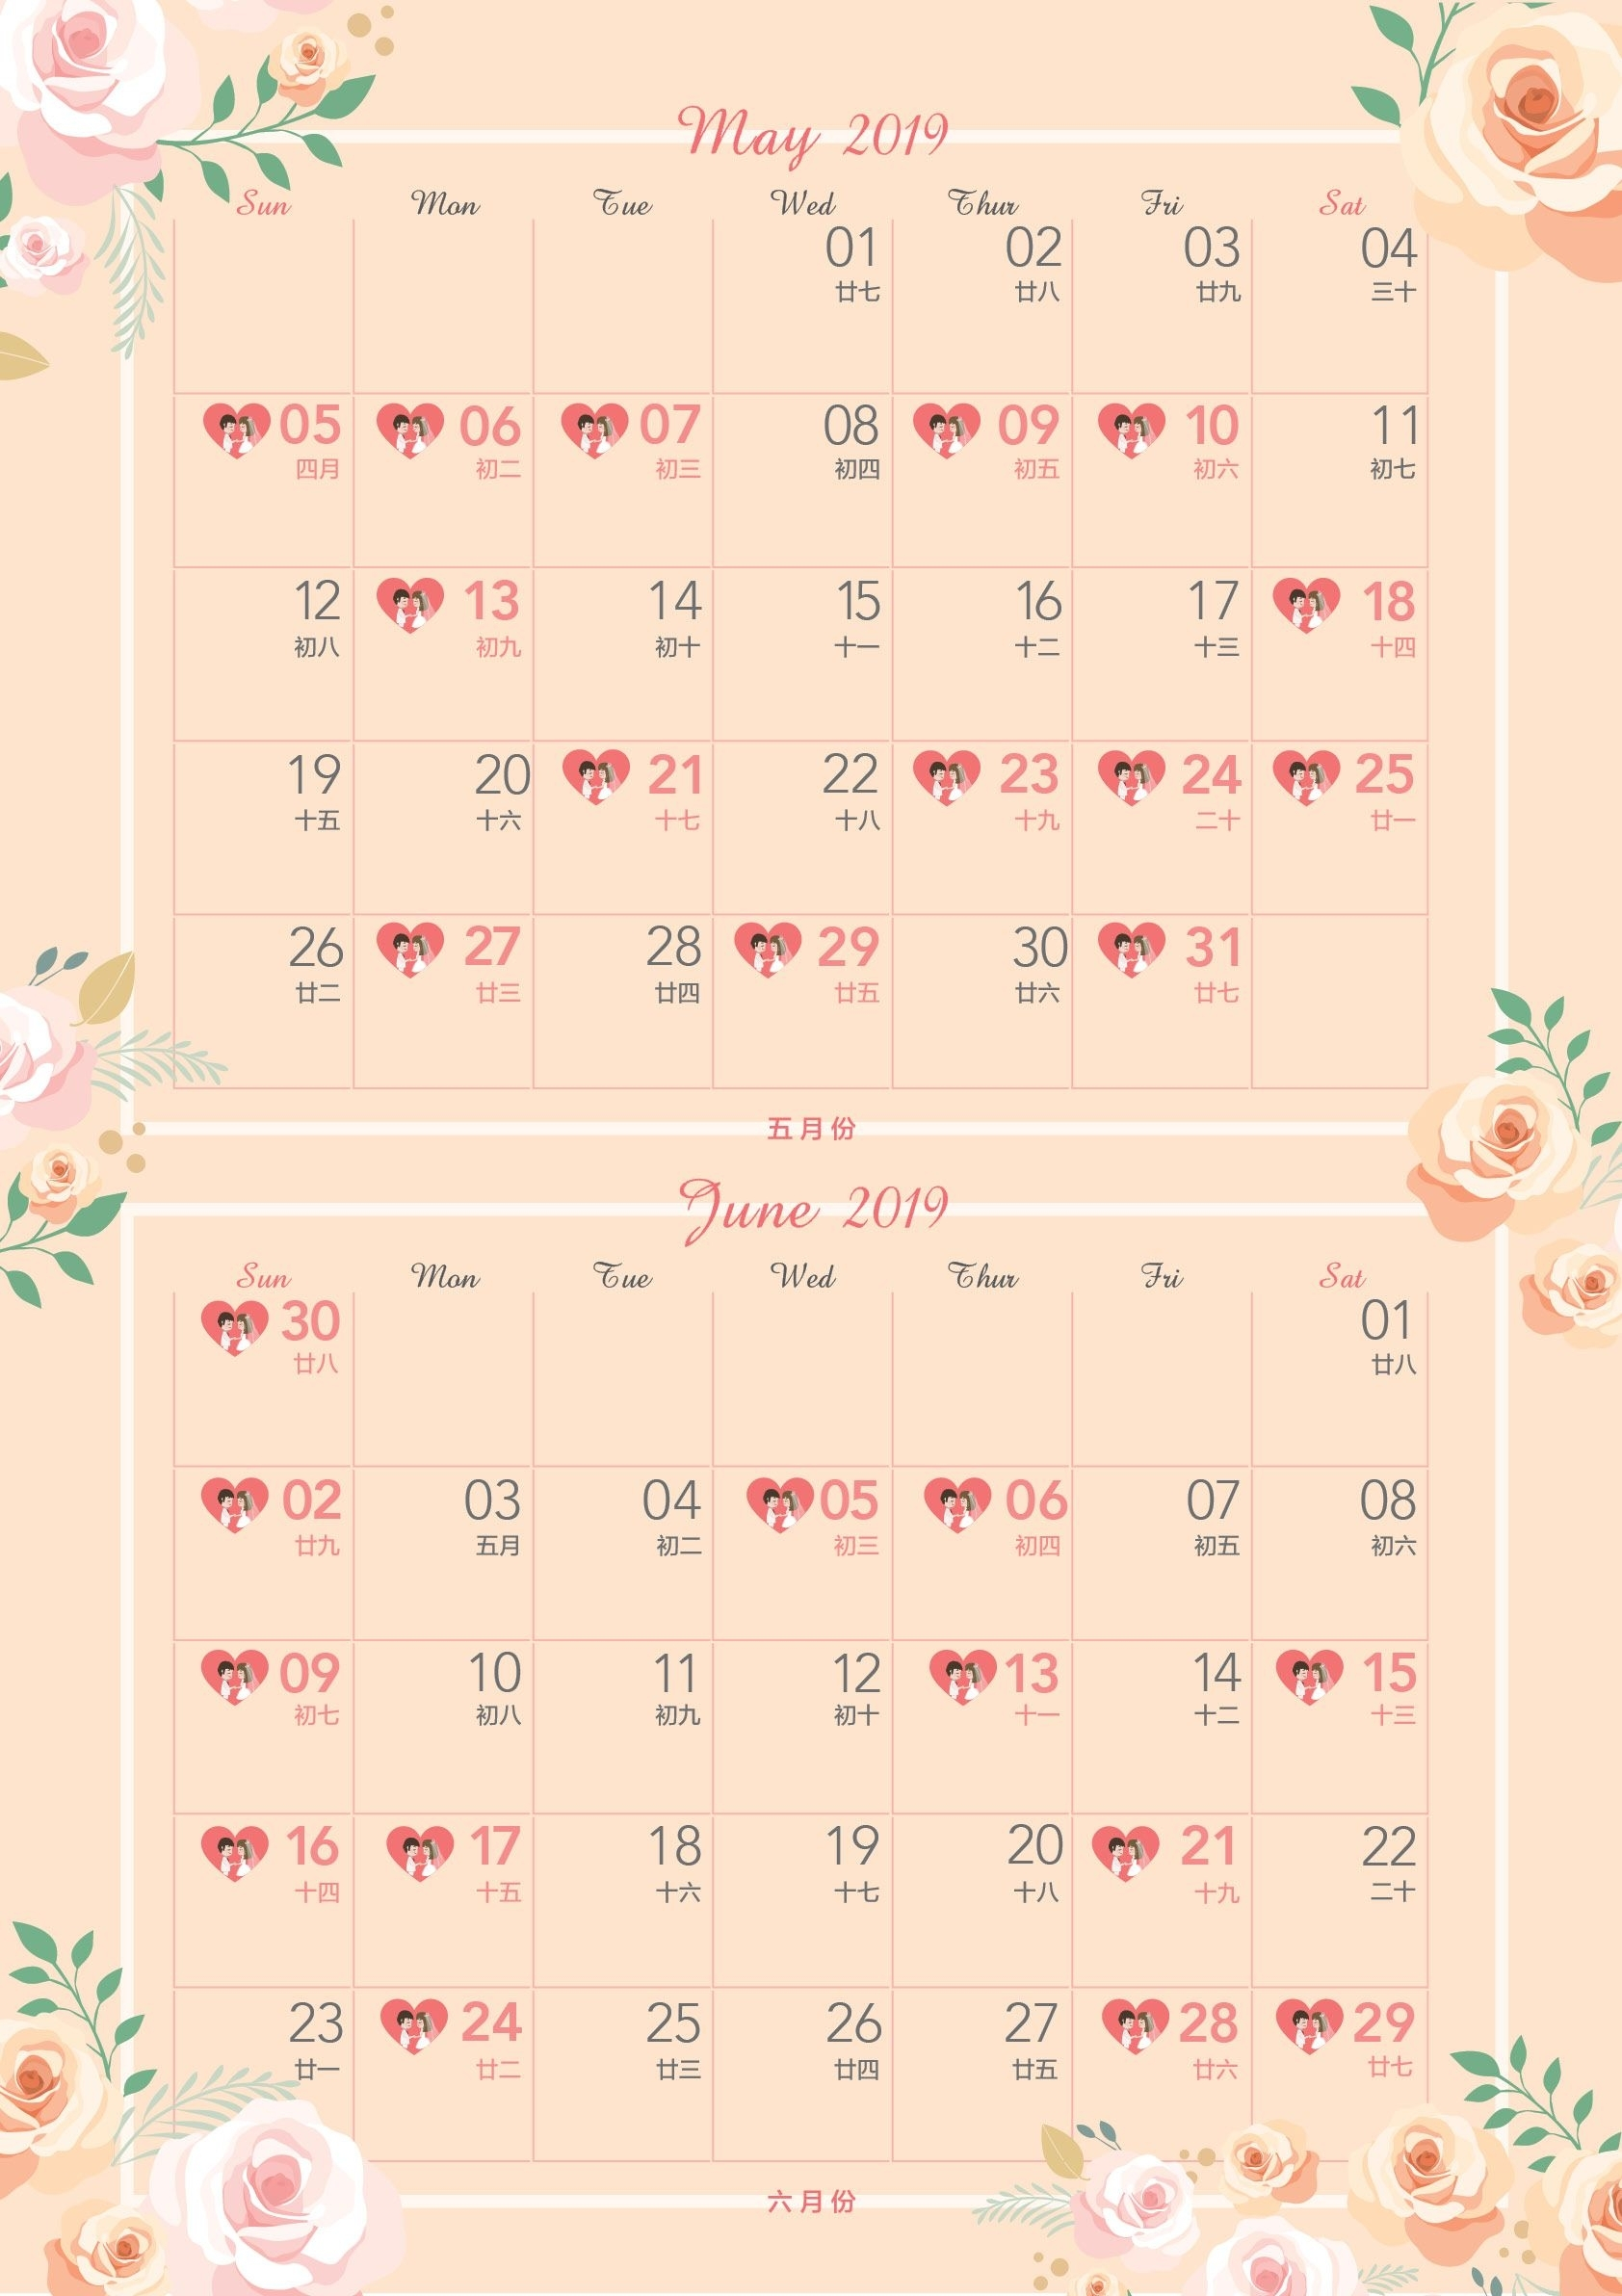 May 2019 - June 2019 Wedding Dates   Wedding Reception